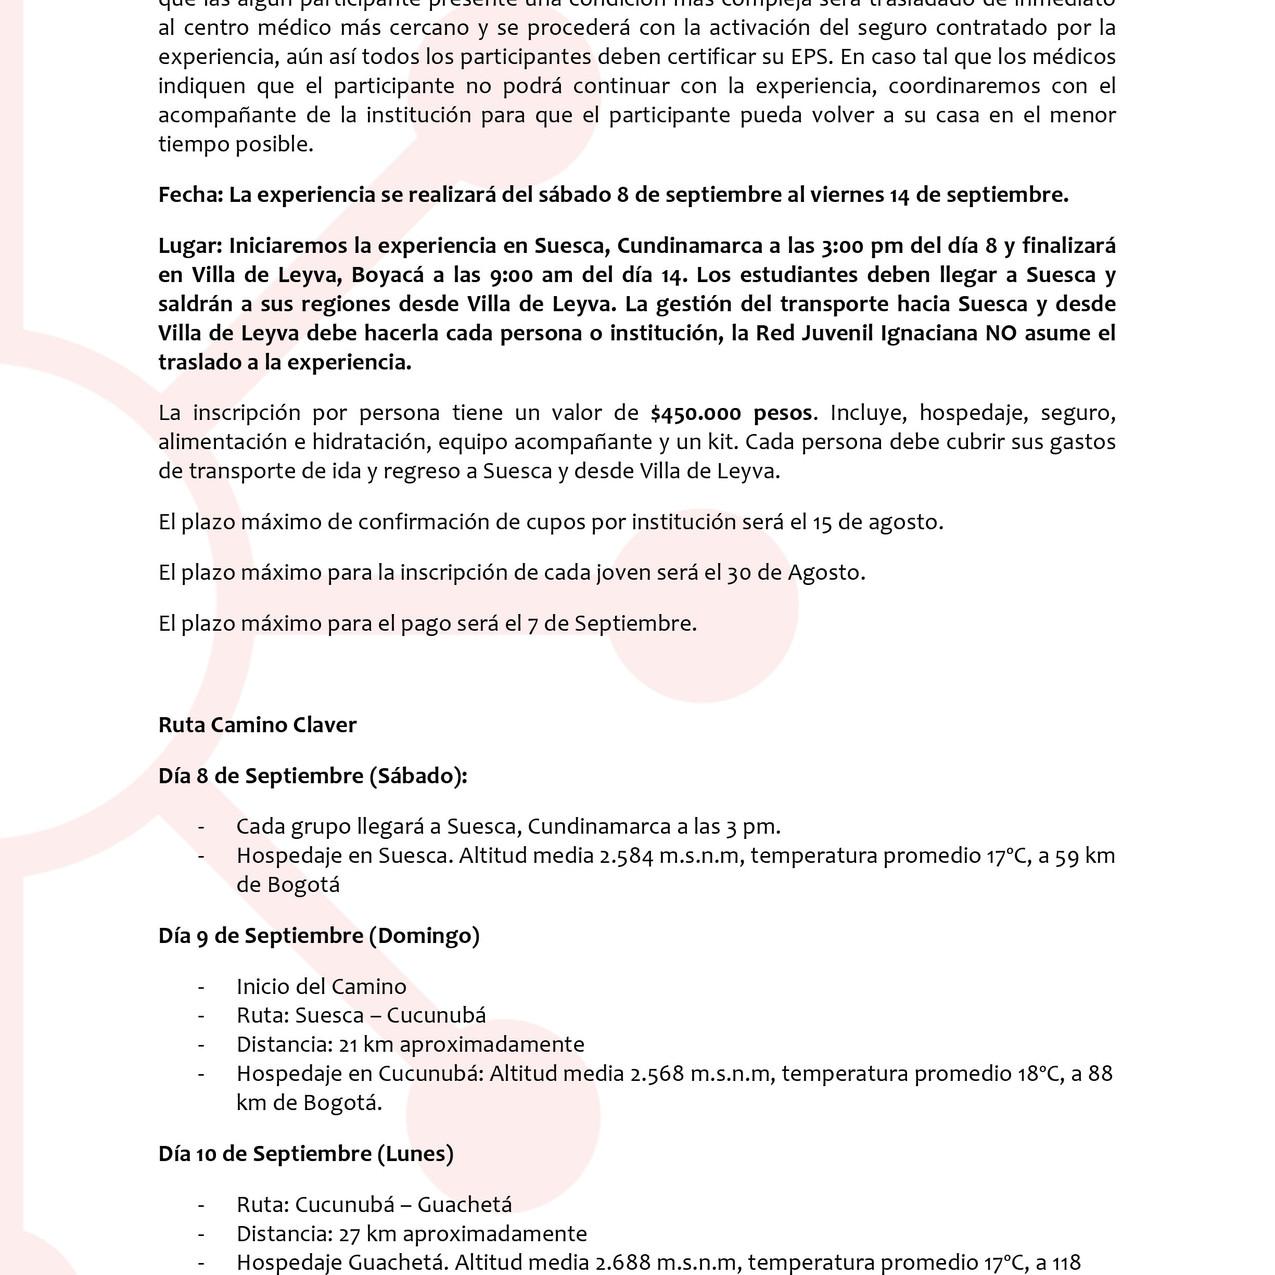 Comunicado 001 -Camino Claver 2018-2